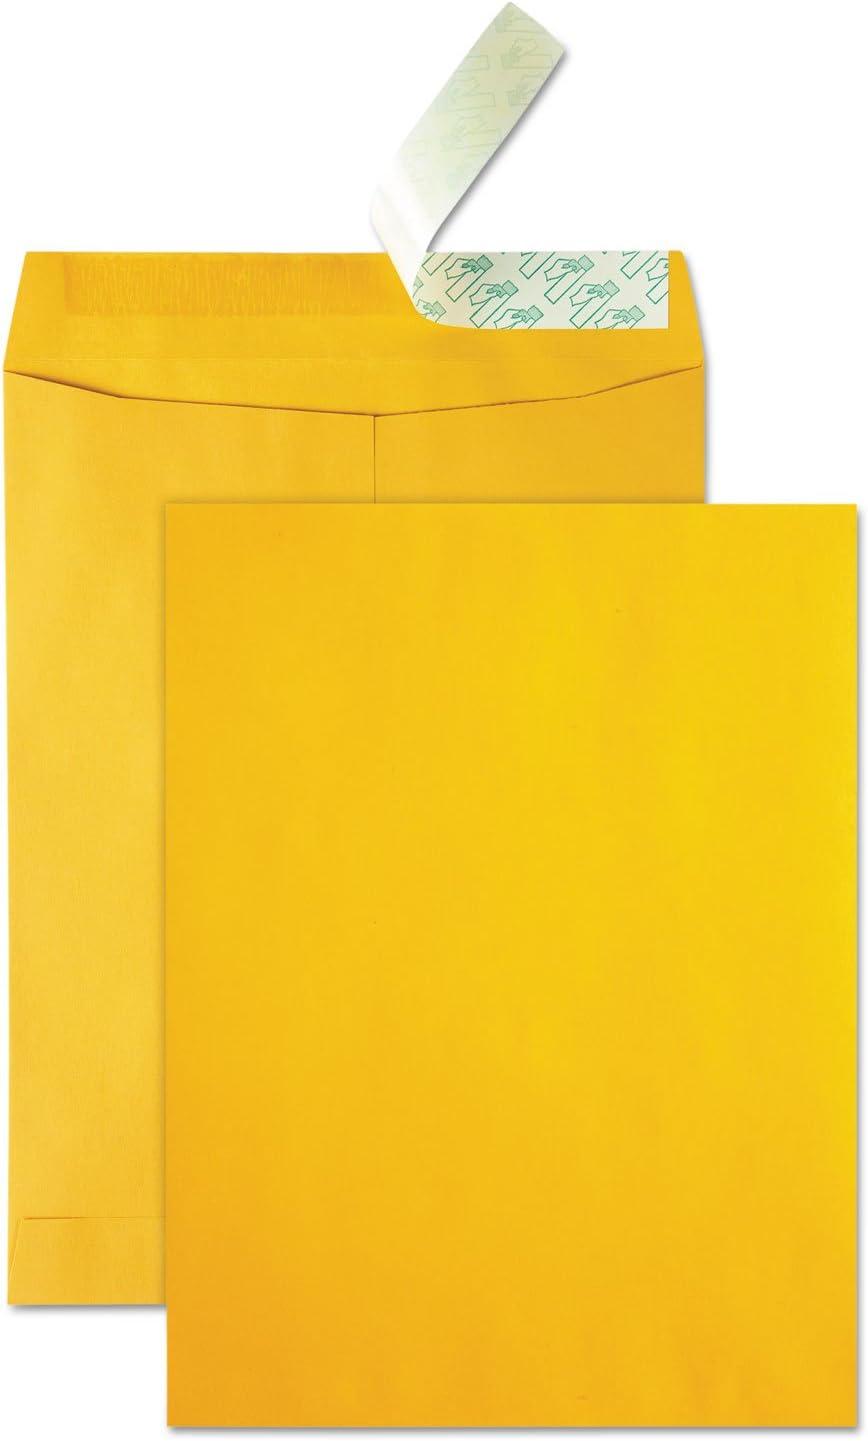 QUA41420 - Quality Park Catalog Kraft Envelopes Durable Max 71% OFF Max 87% OFF